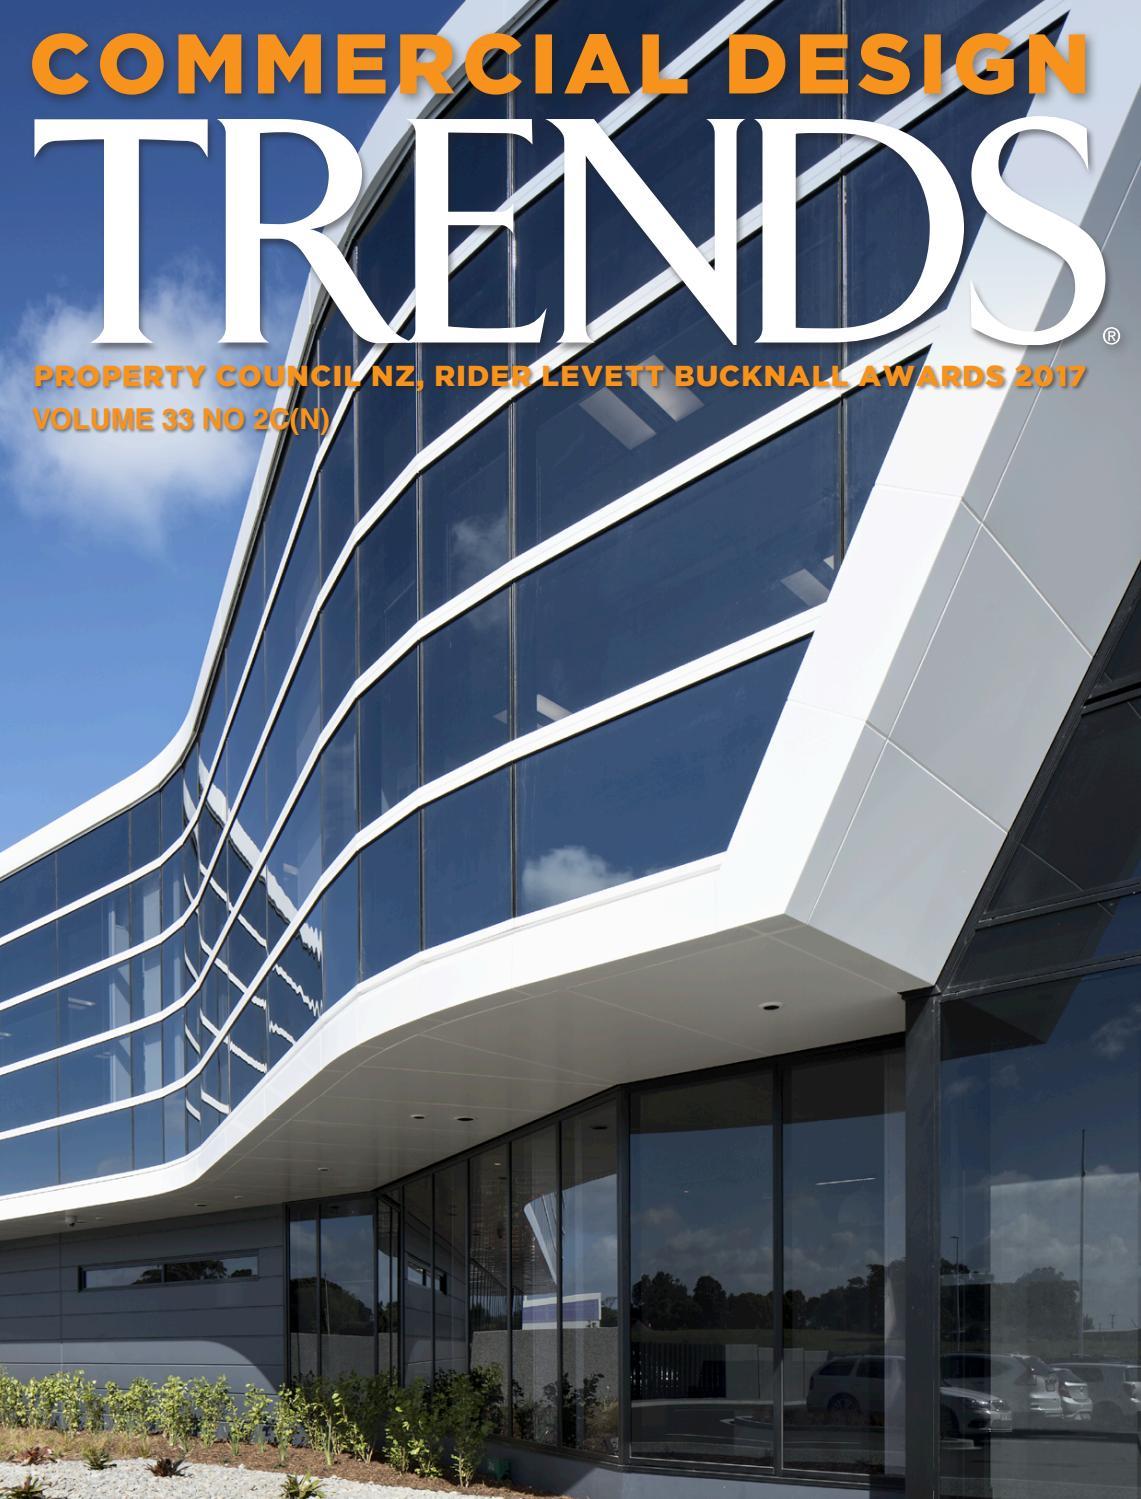 New zealand commercial design trends series nz commercial design ...